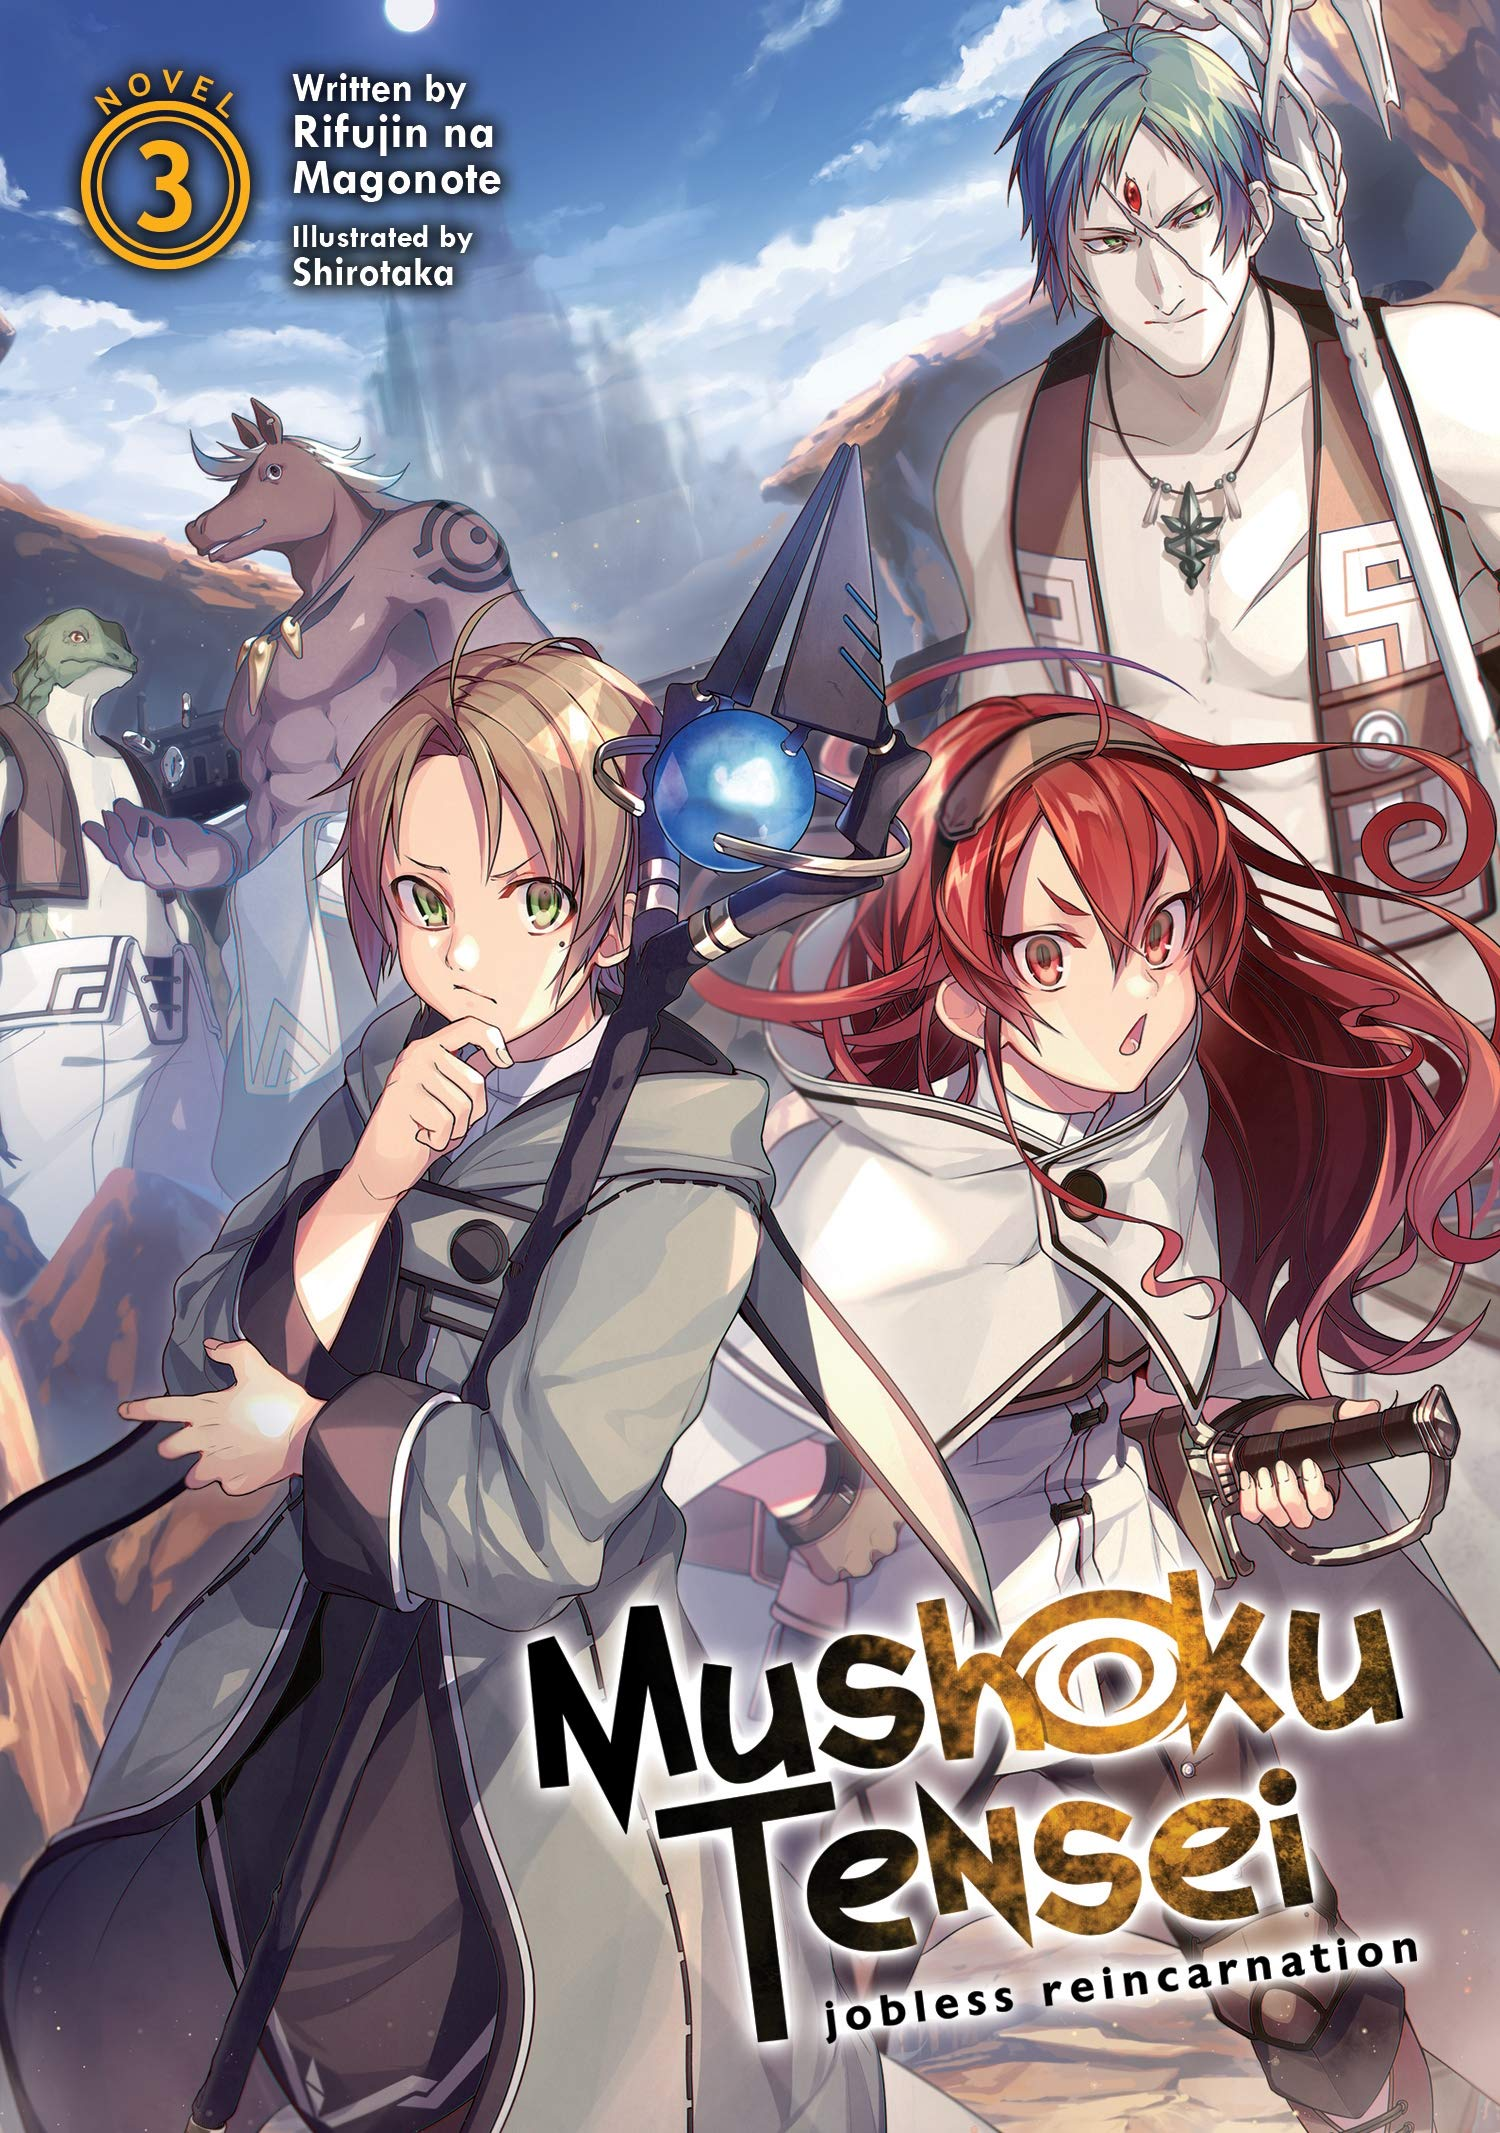 Mushoku Tensei: Jobless Reincarnation Light Novel Vol  3 Mushoku